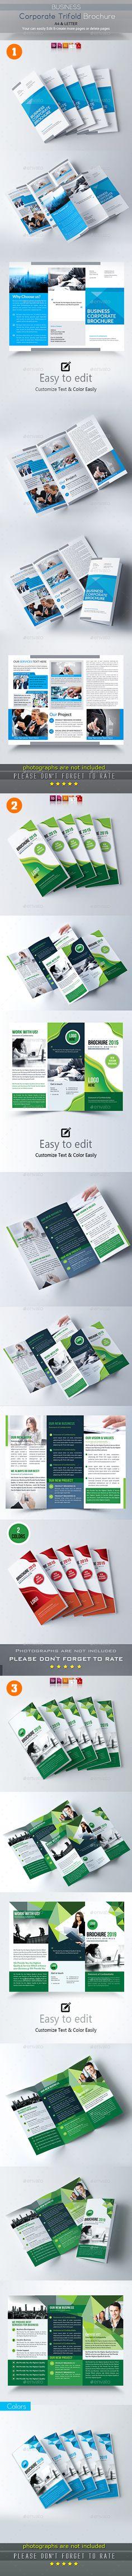 Trifold Brochure Templates Bundle Vector EPS, InDesign INDD, AI Illustrator